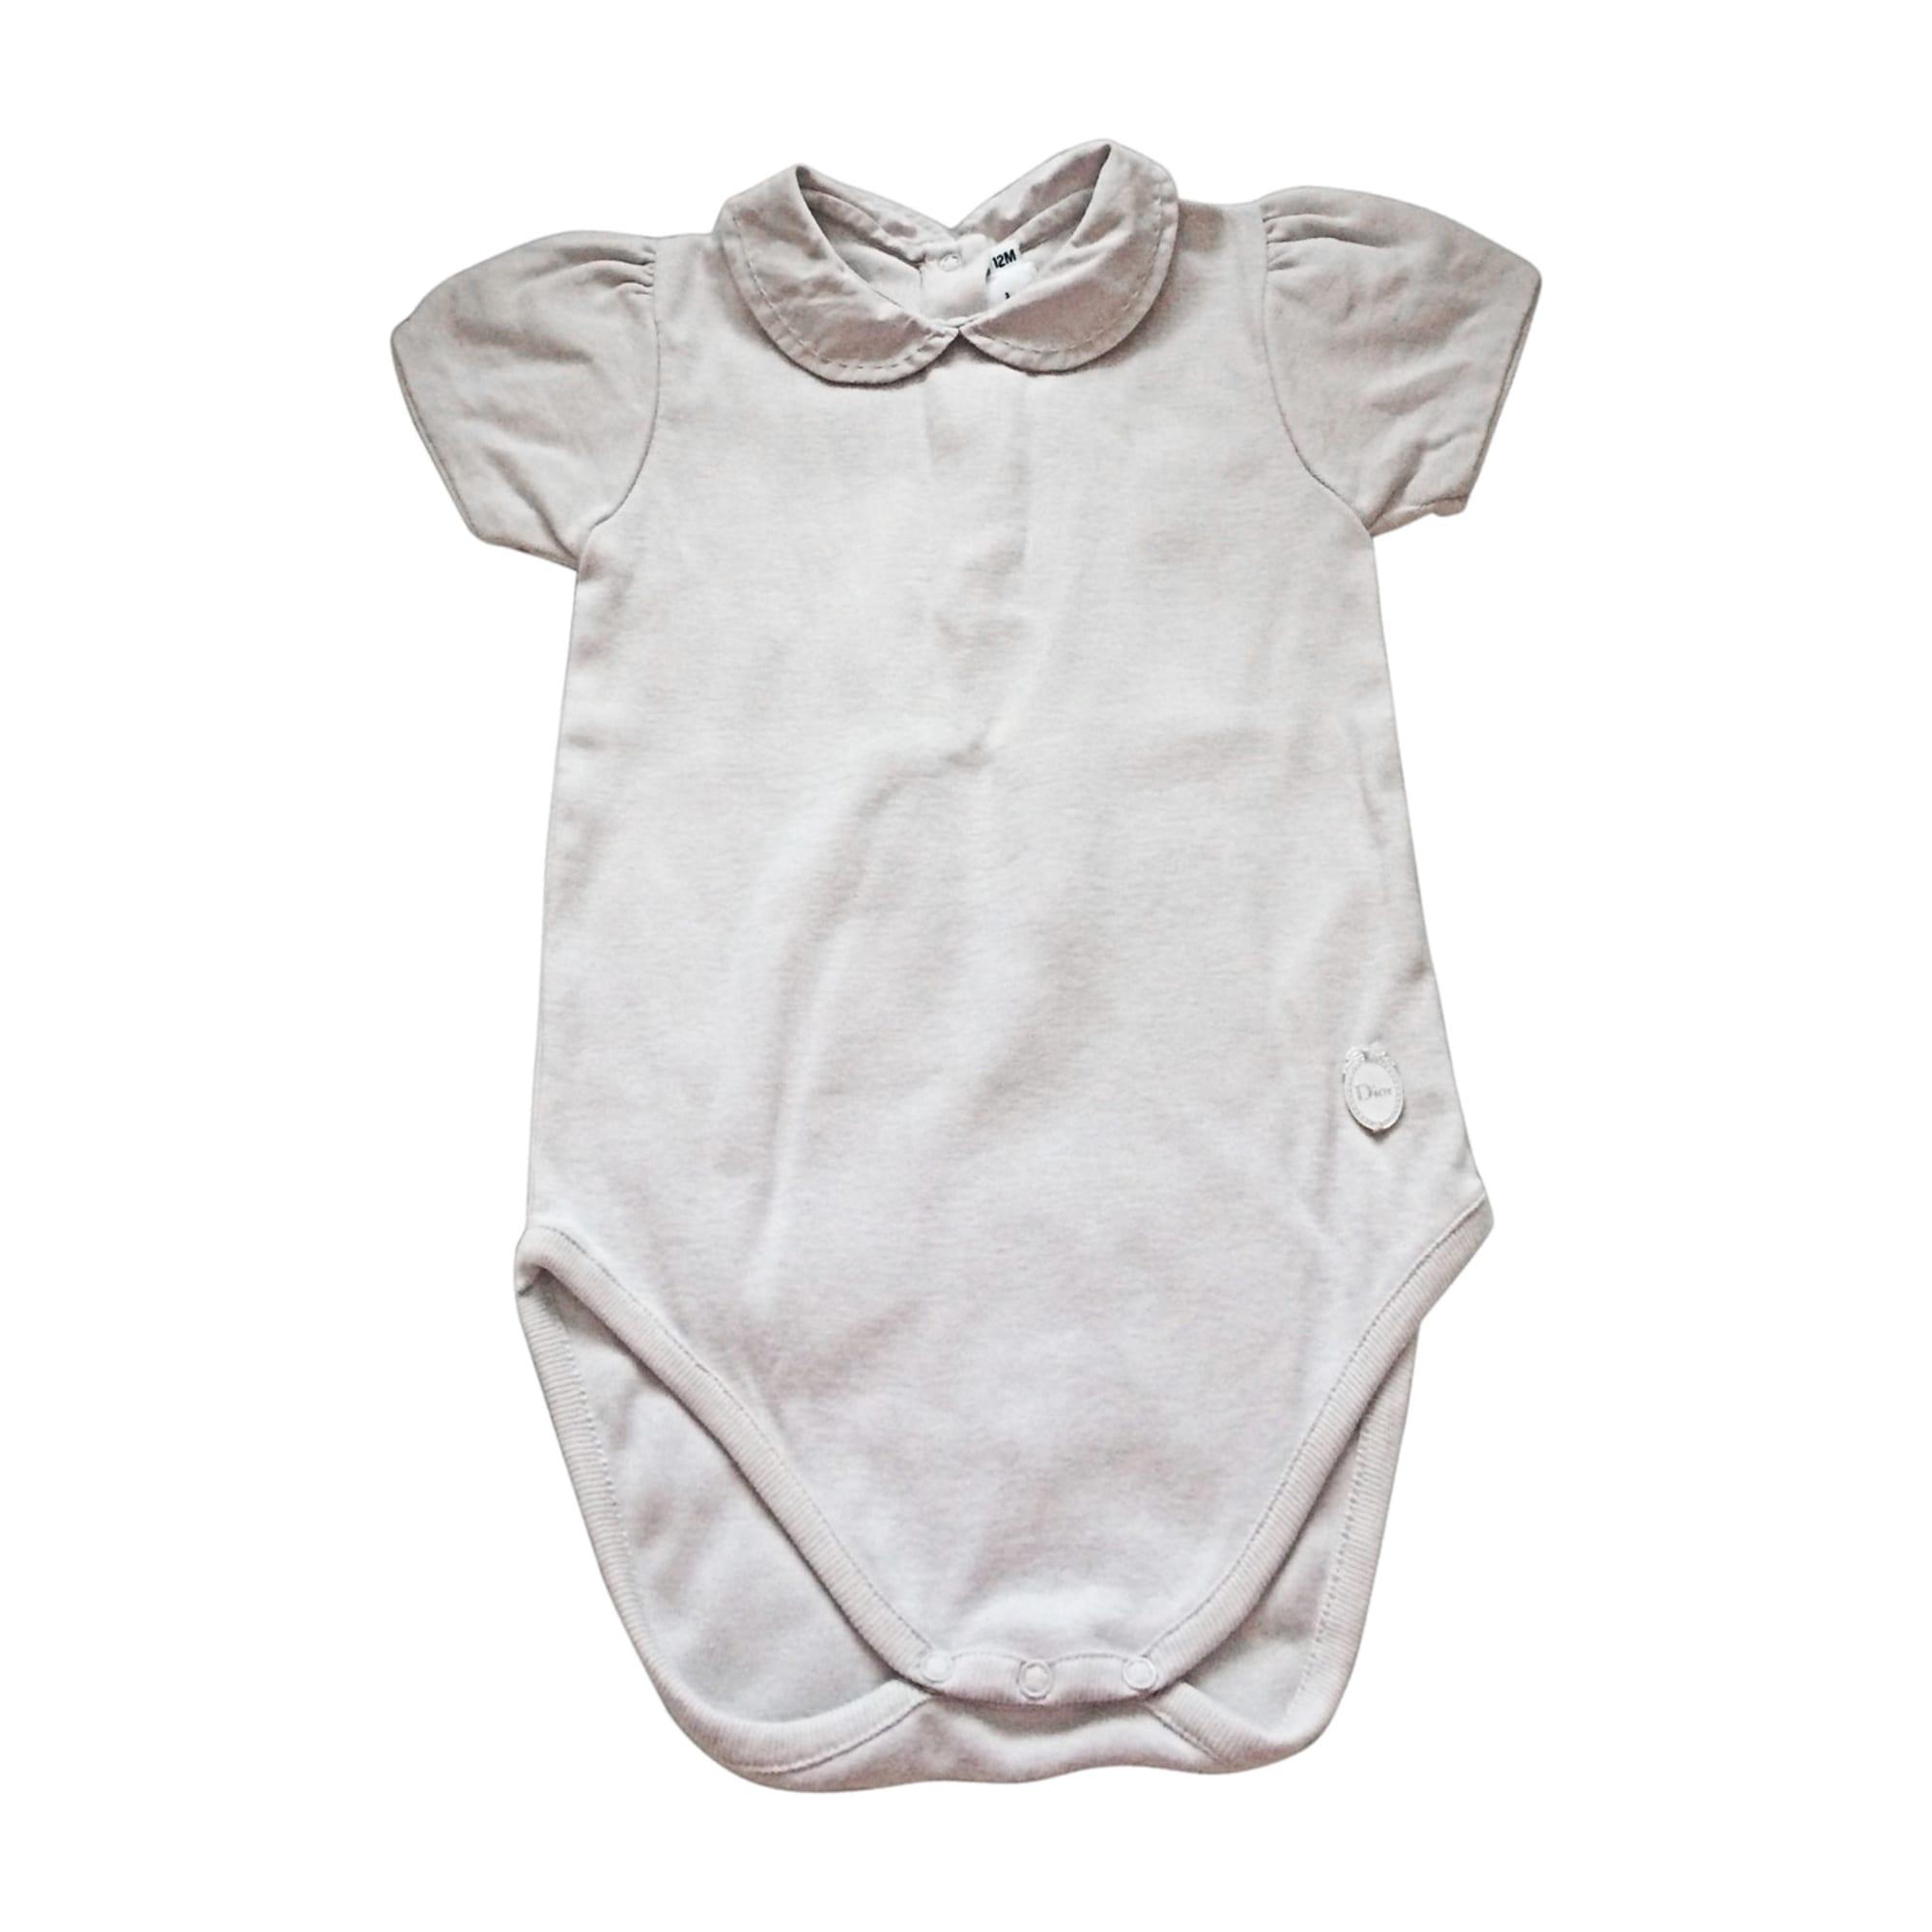 Body BABY DIOR Grigio, antracite